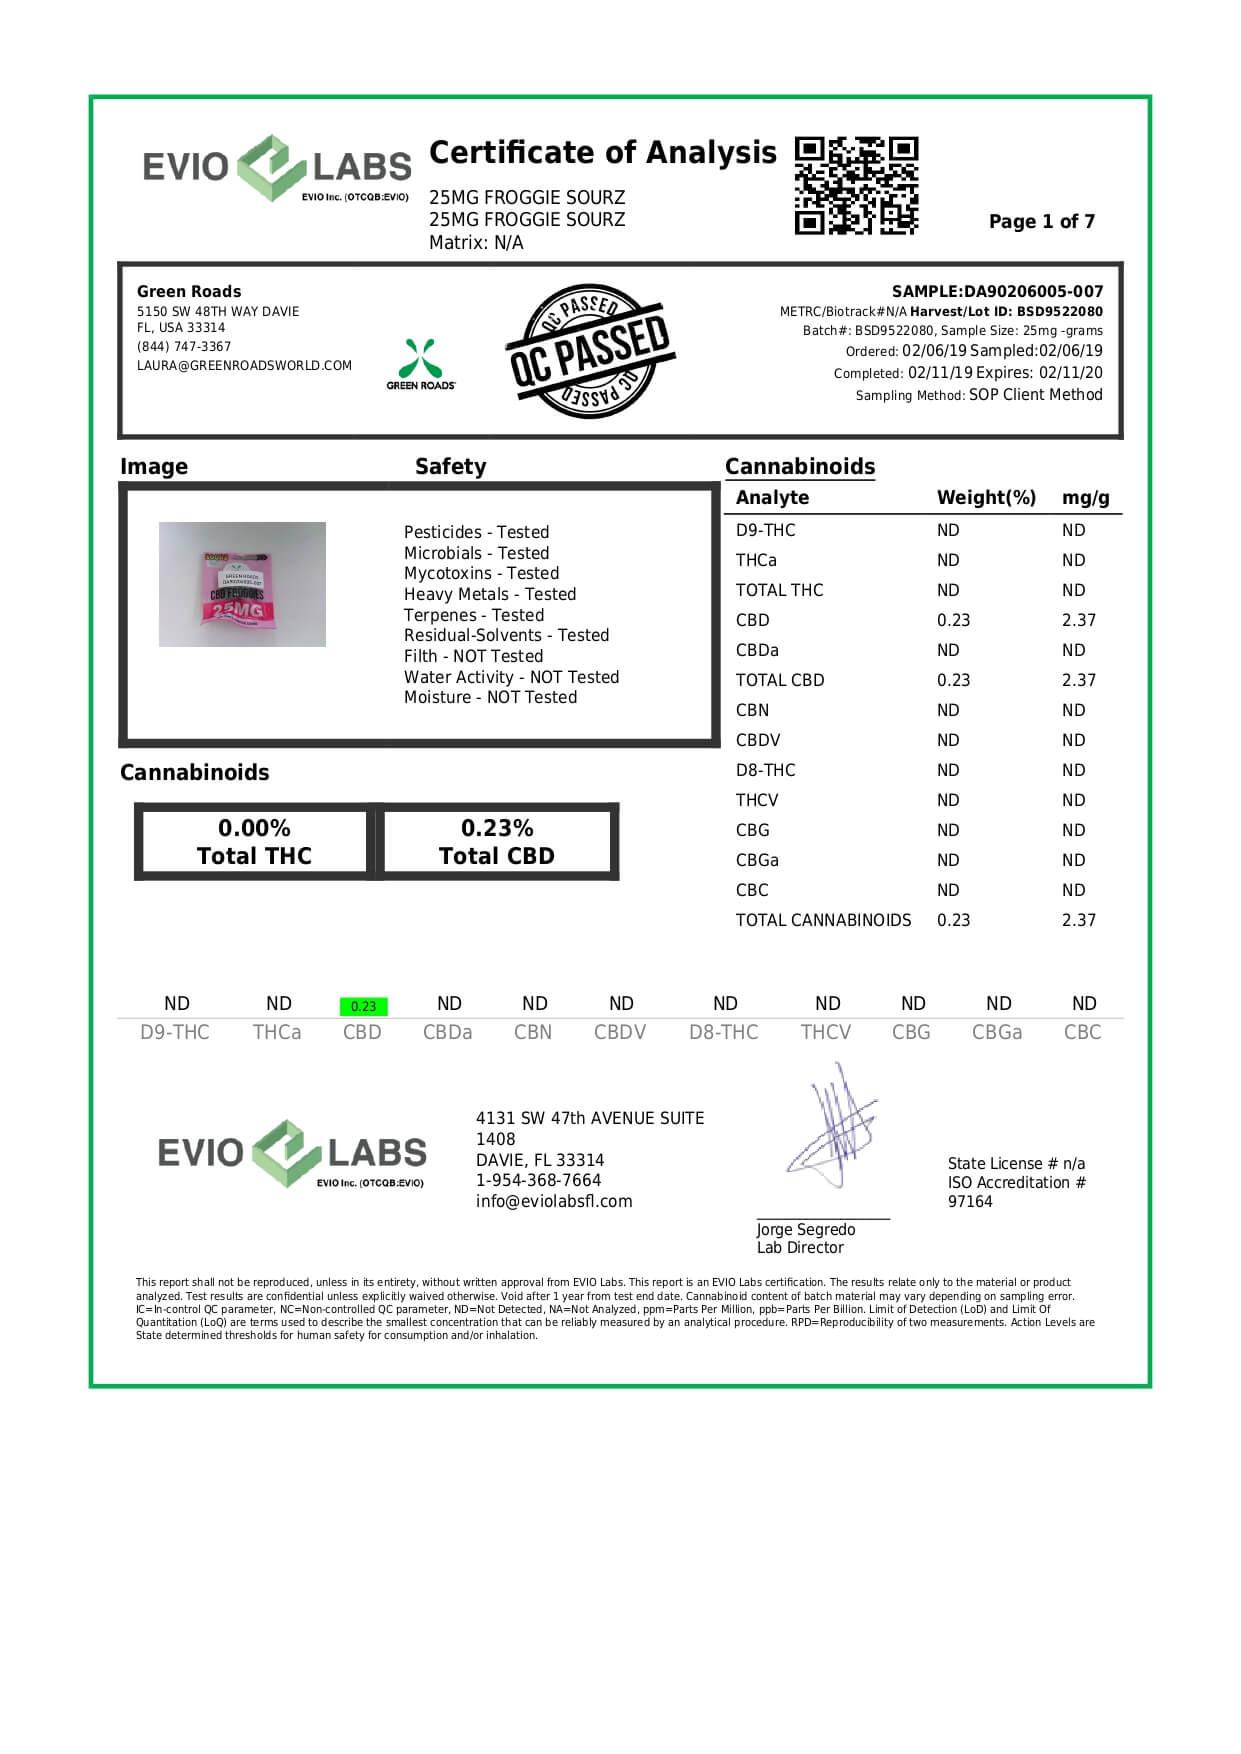 Green Roads CBD Edible Froggies SOURZ OTG Lab Report